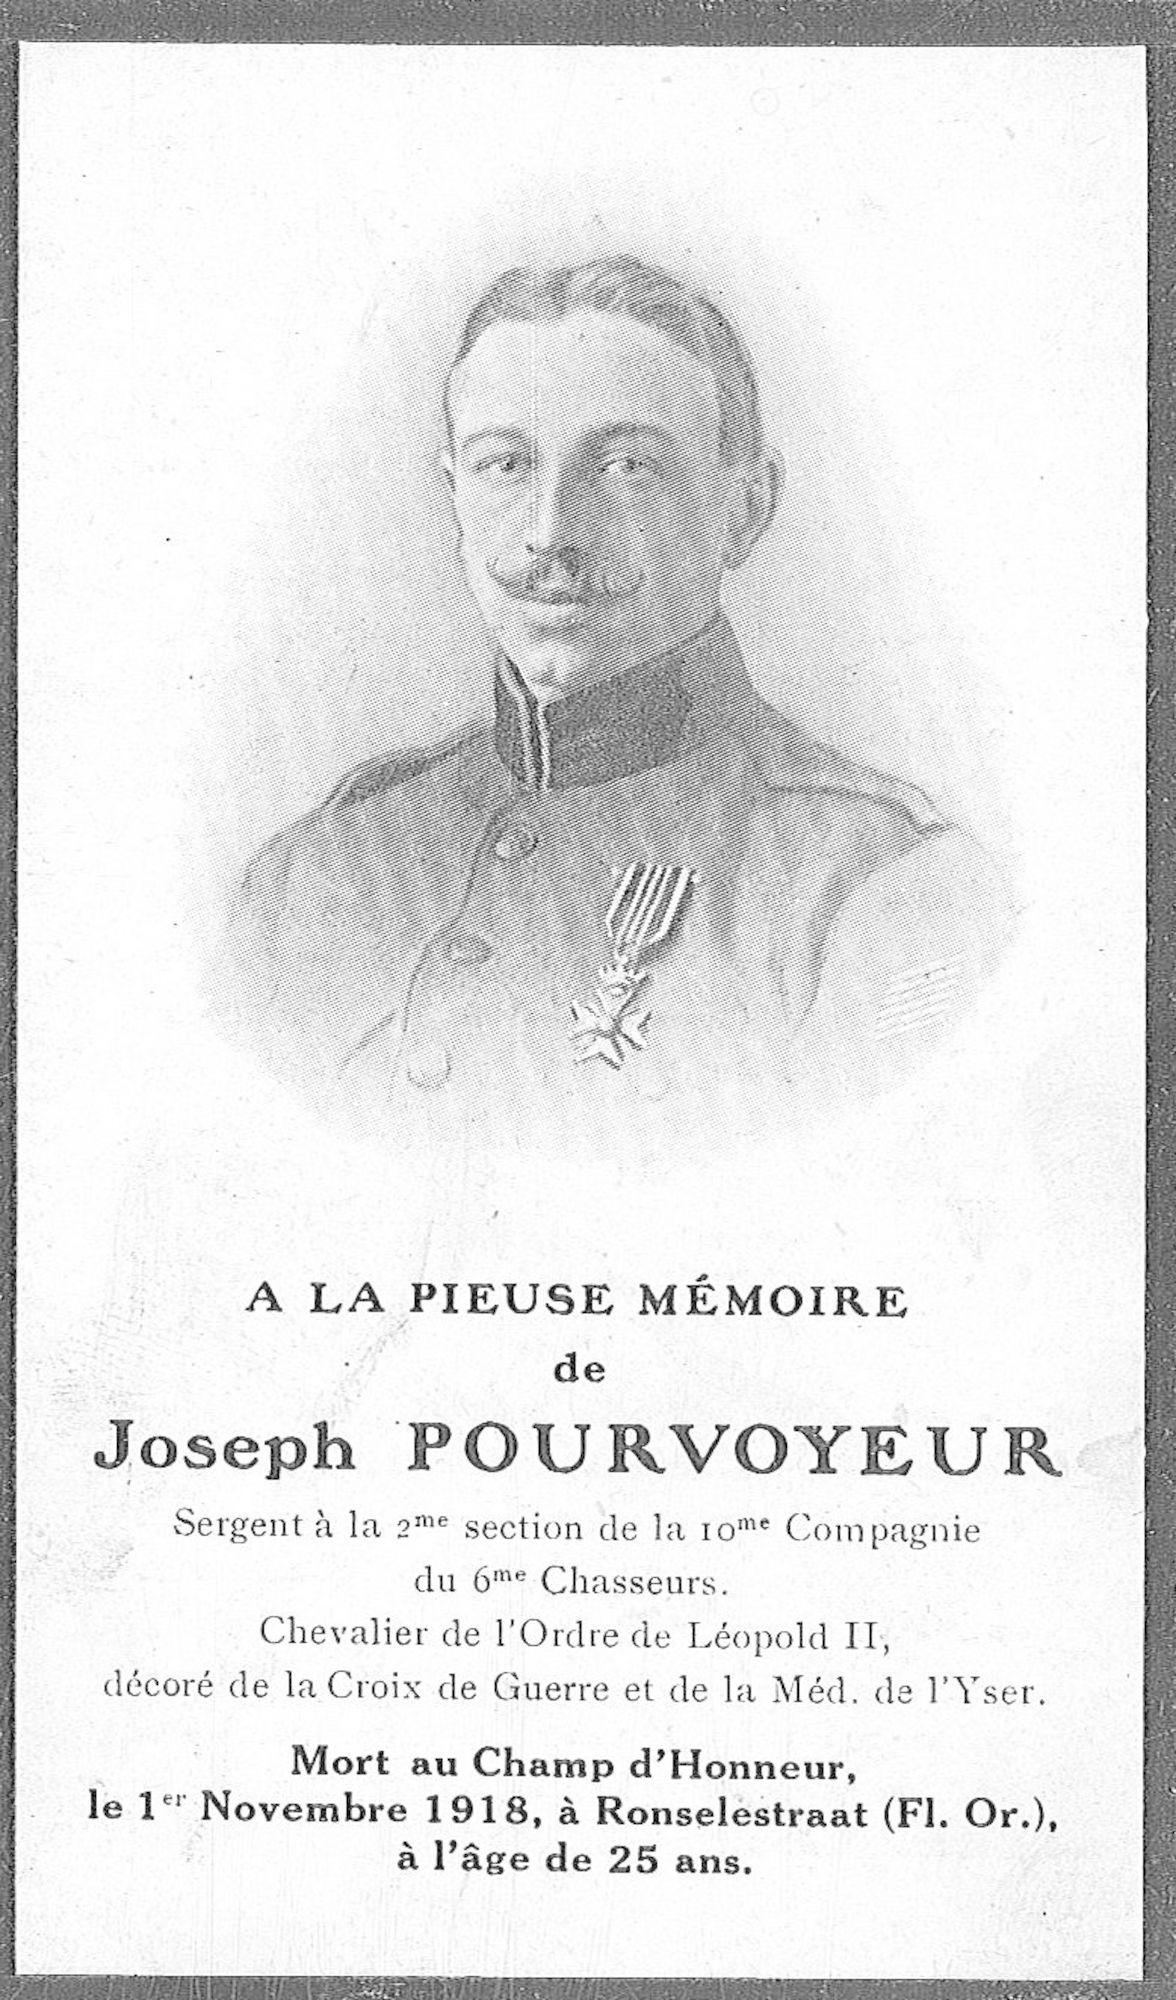 Joseph Pourvoyeur